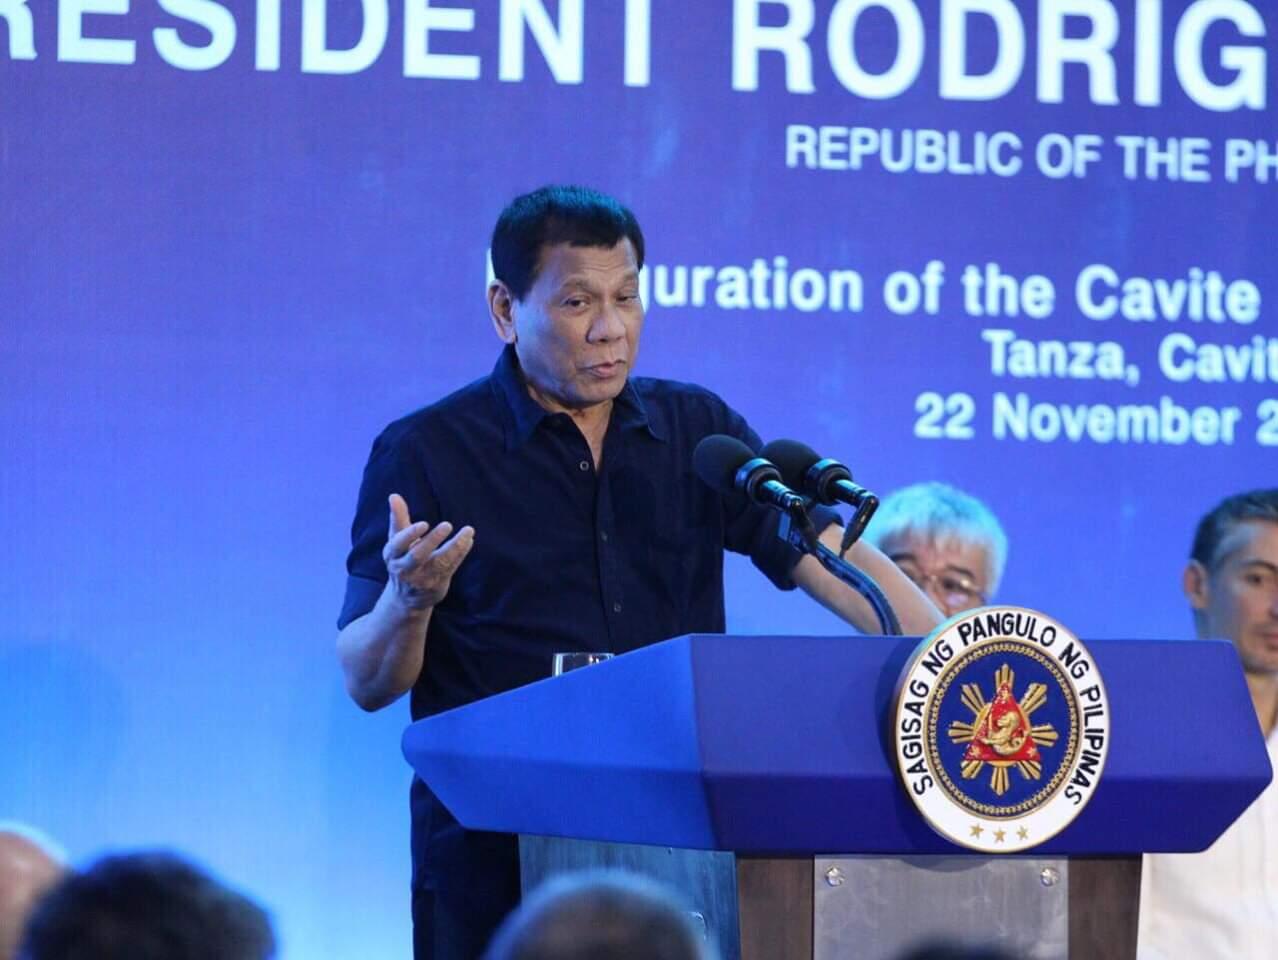 President Rodrigo Duterte speaks during the 35th anniversary of Army Reserve Command (ARESCOM)